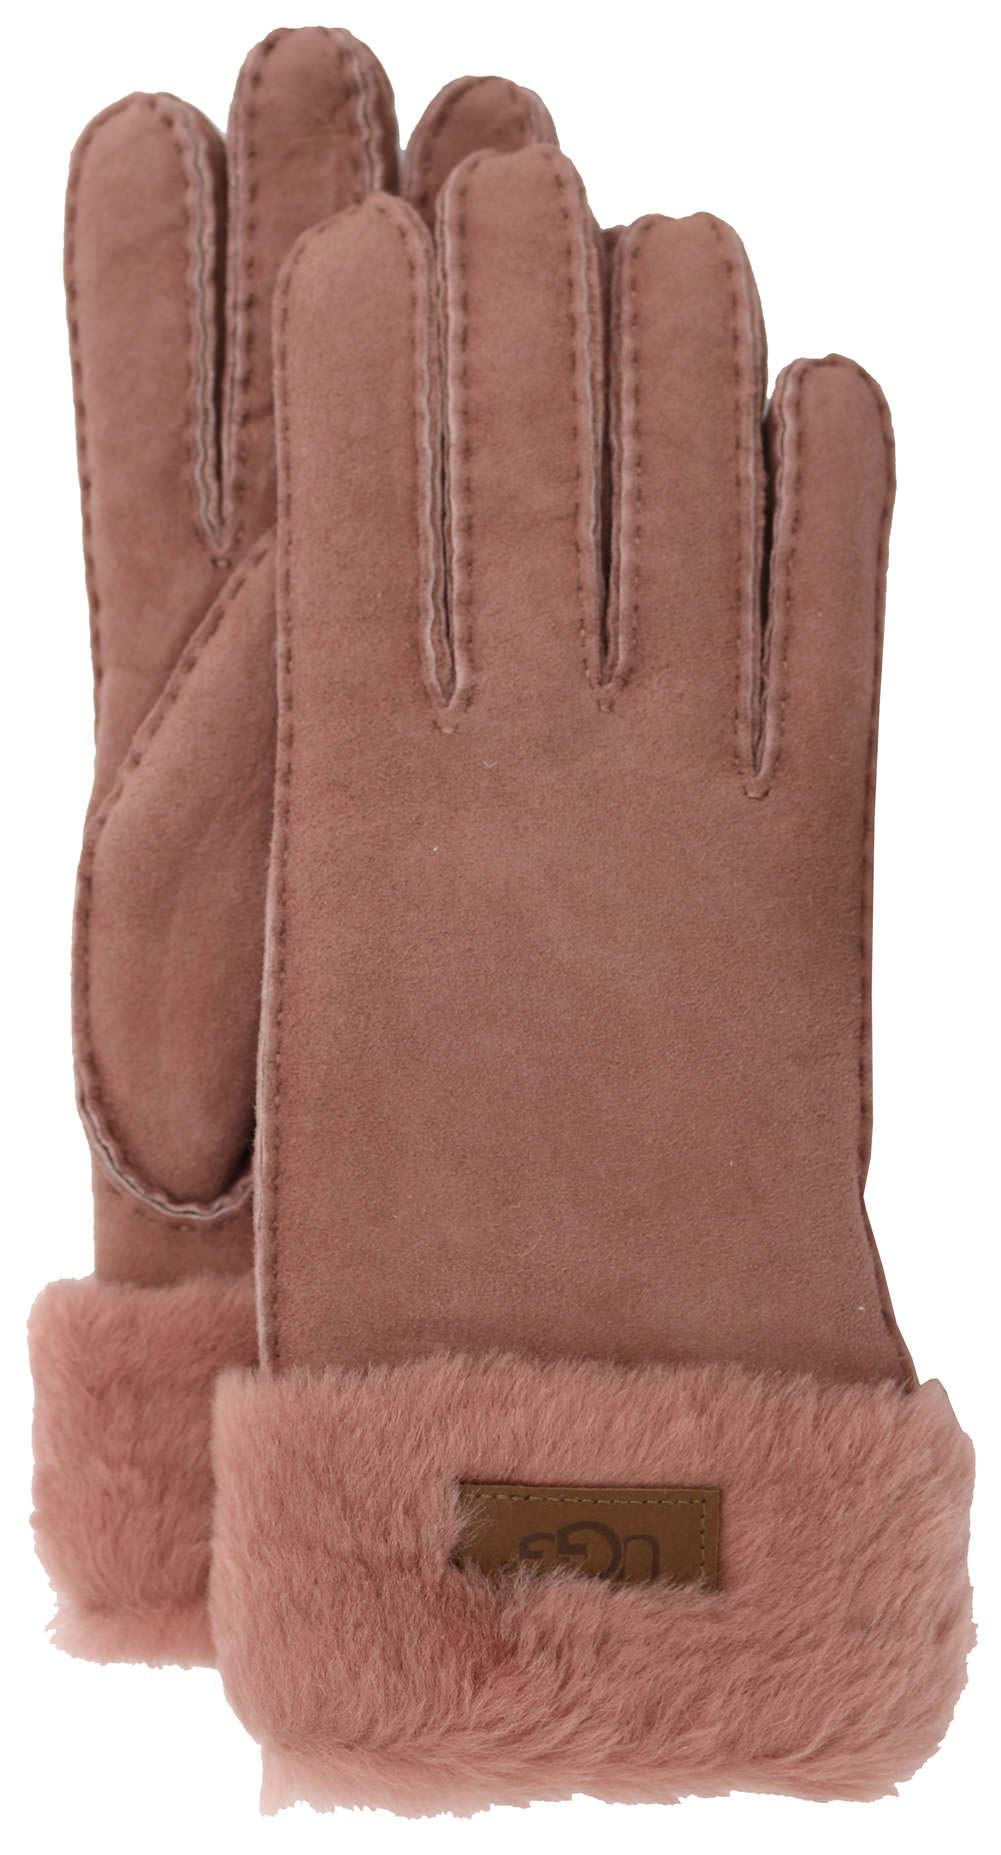 UGG Women's Turn Cuff Water Resistant Sheepskin Gloves Lantana Pink LG